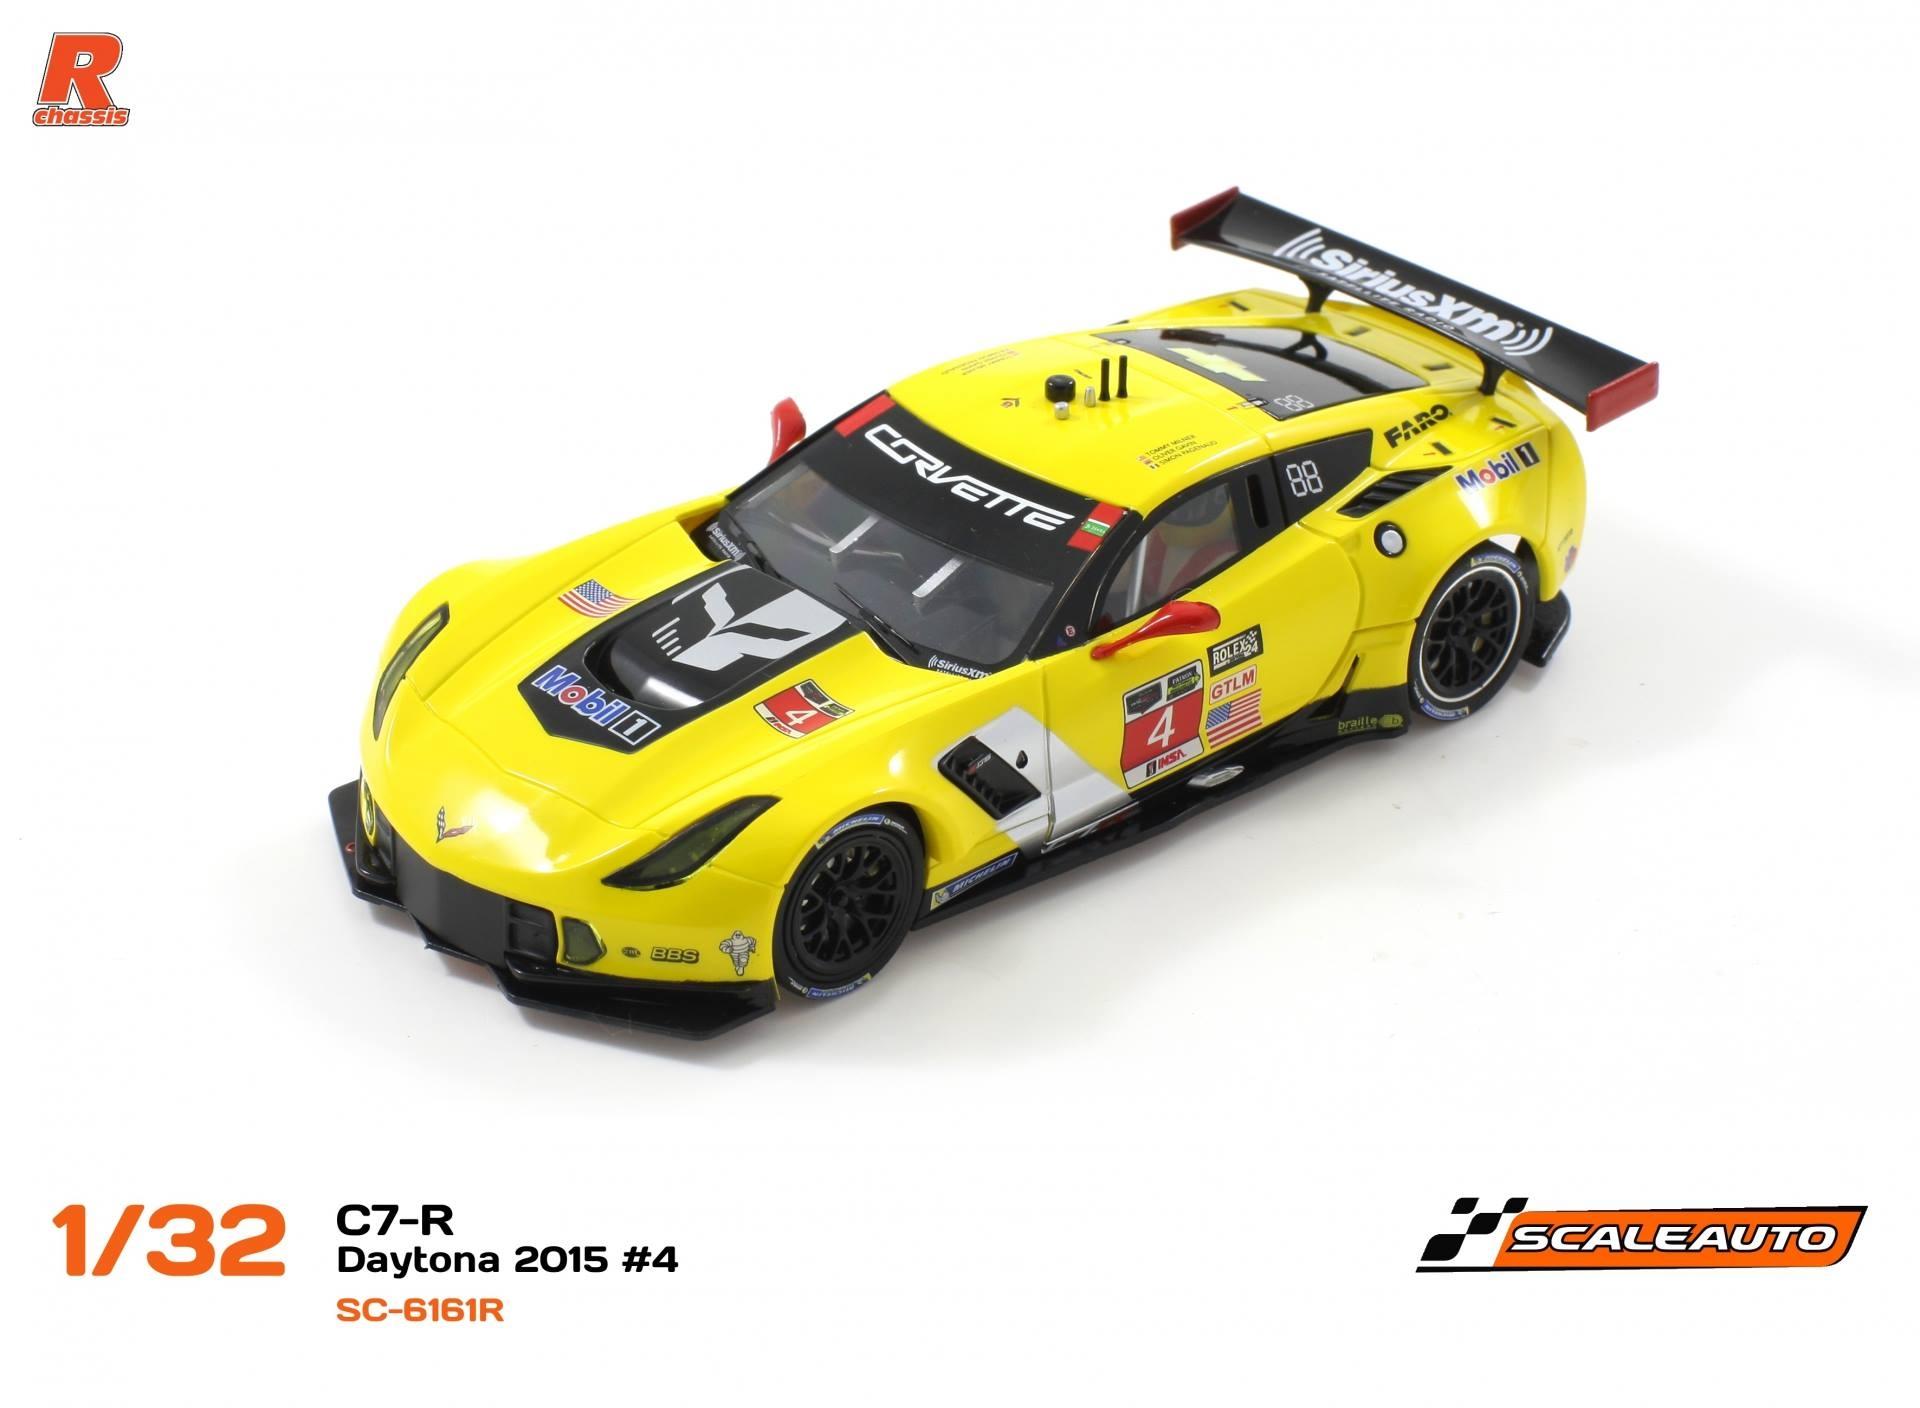 Scaleauto Corvette C7r Gt3 des 24 h. Daytona 2015 #4